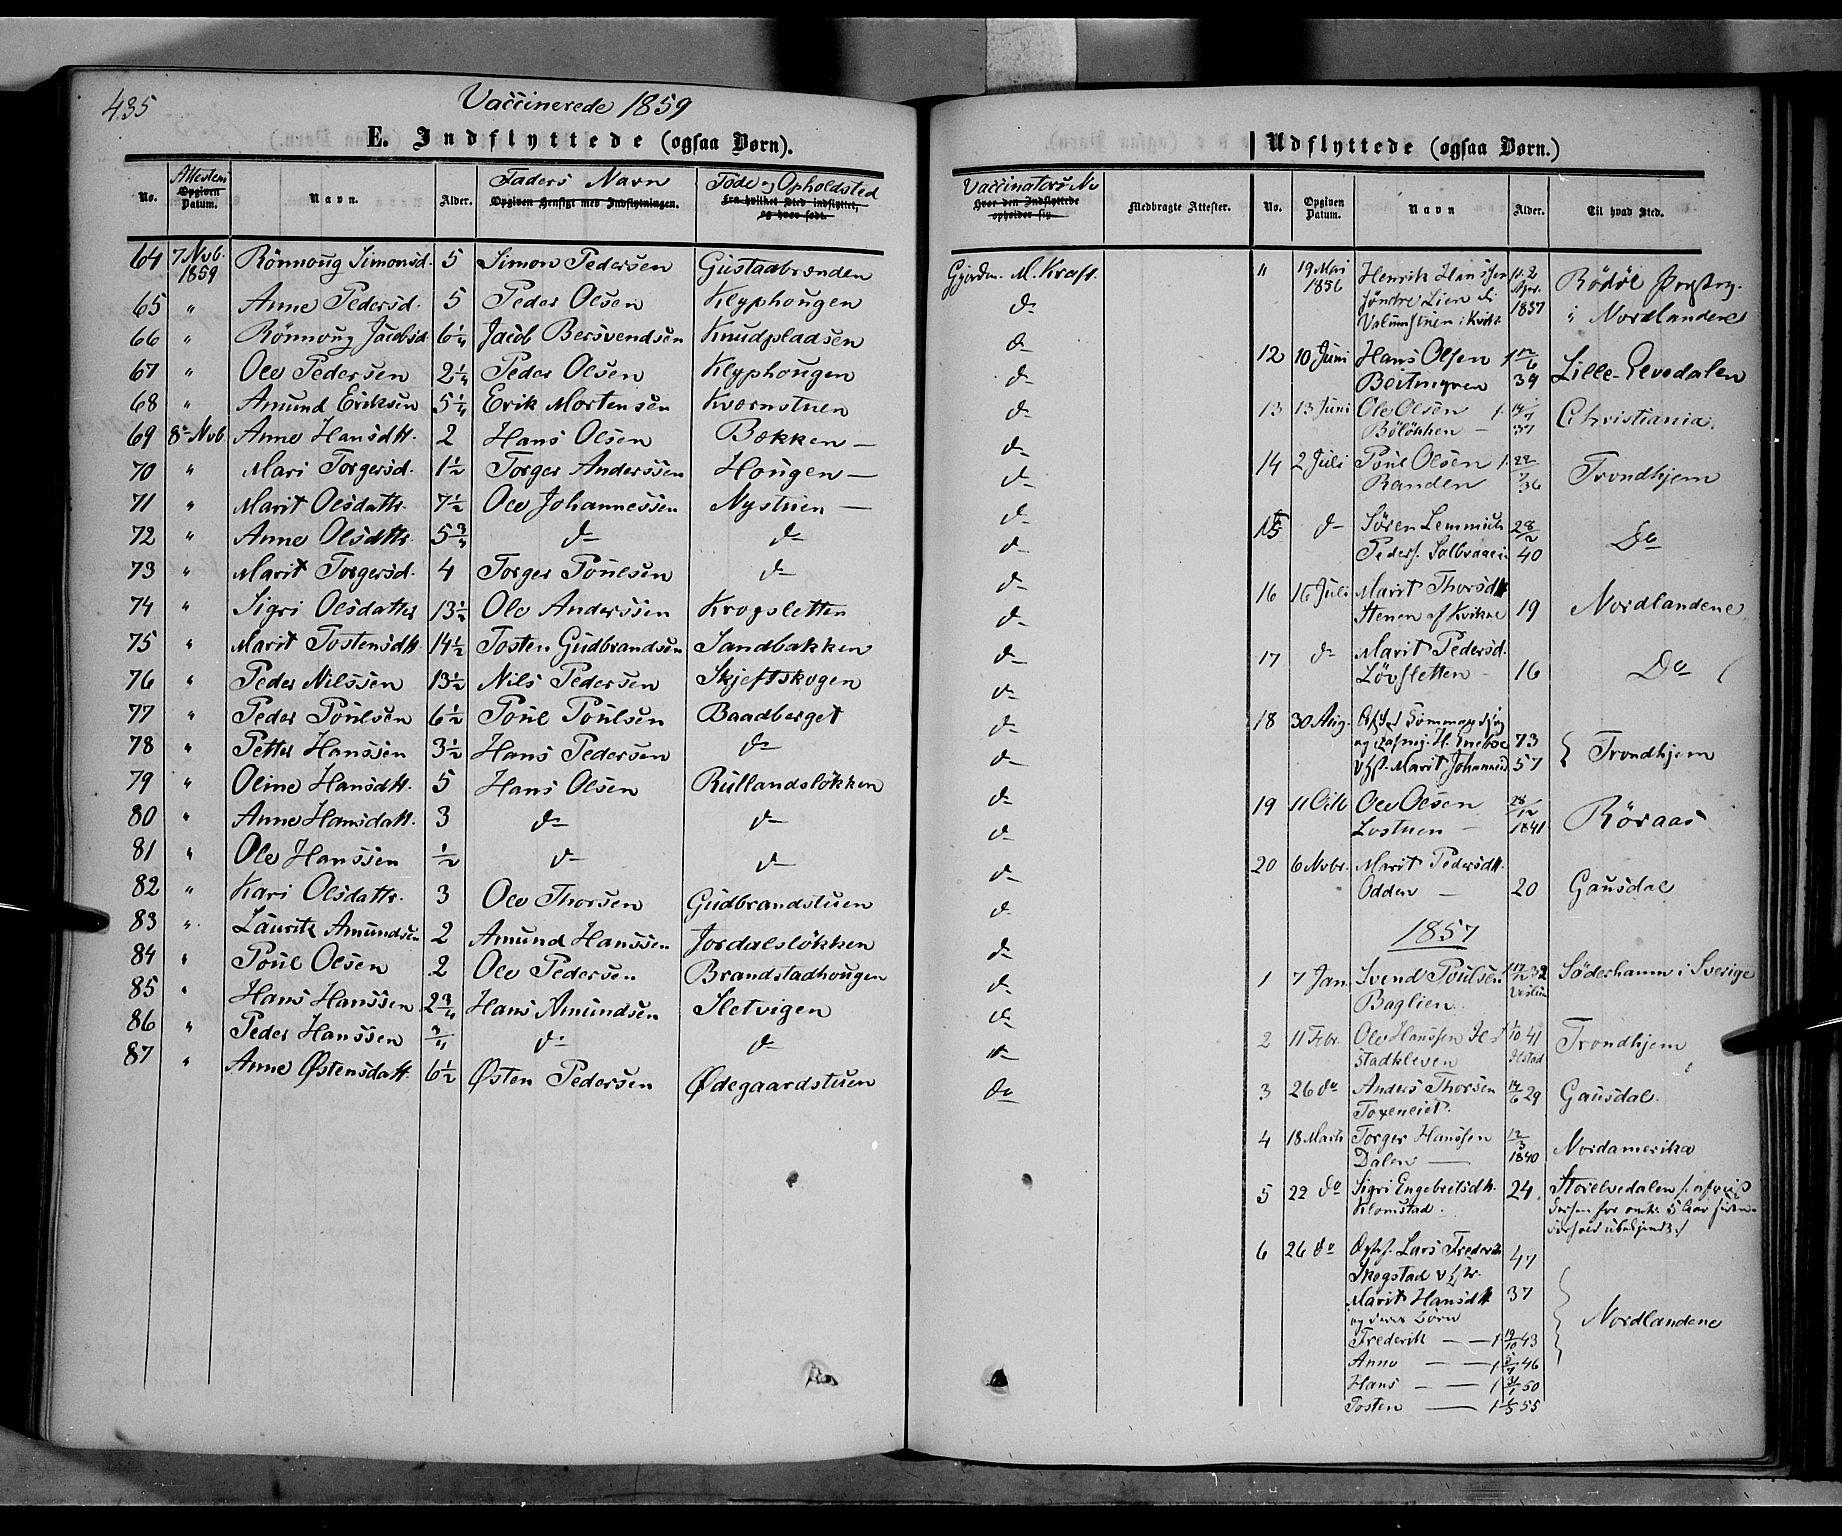 SAH, Nord-Fron prestekontor, Ministerialbok nr. 1, 1851-1864, s. 435